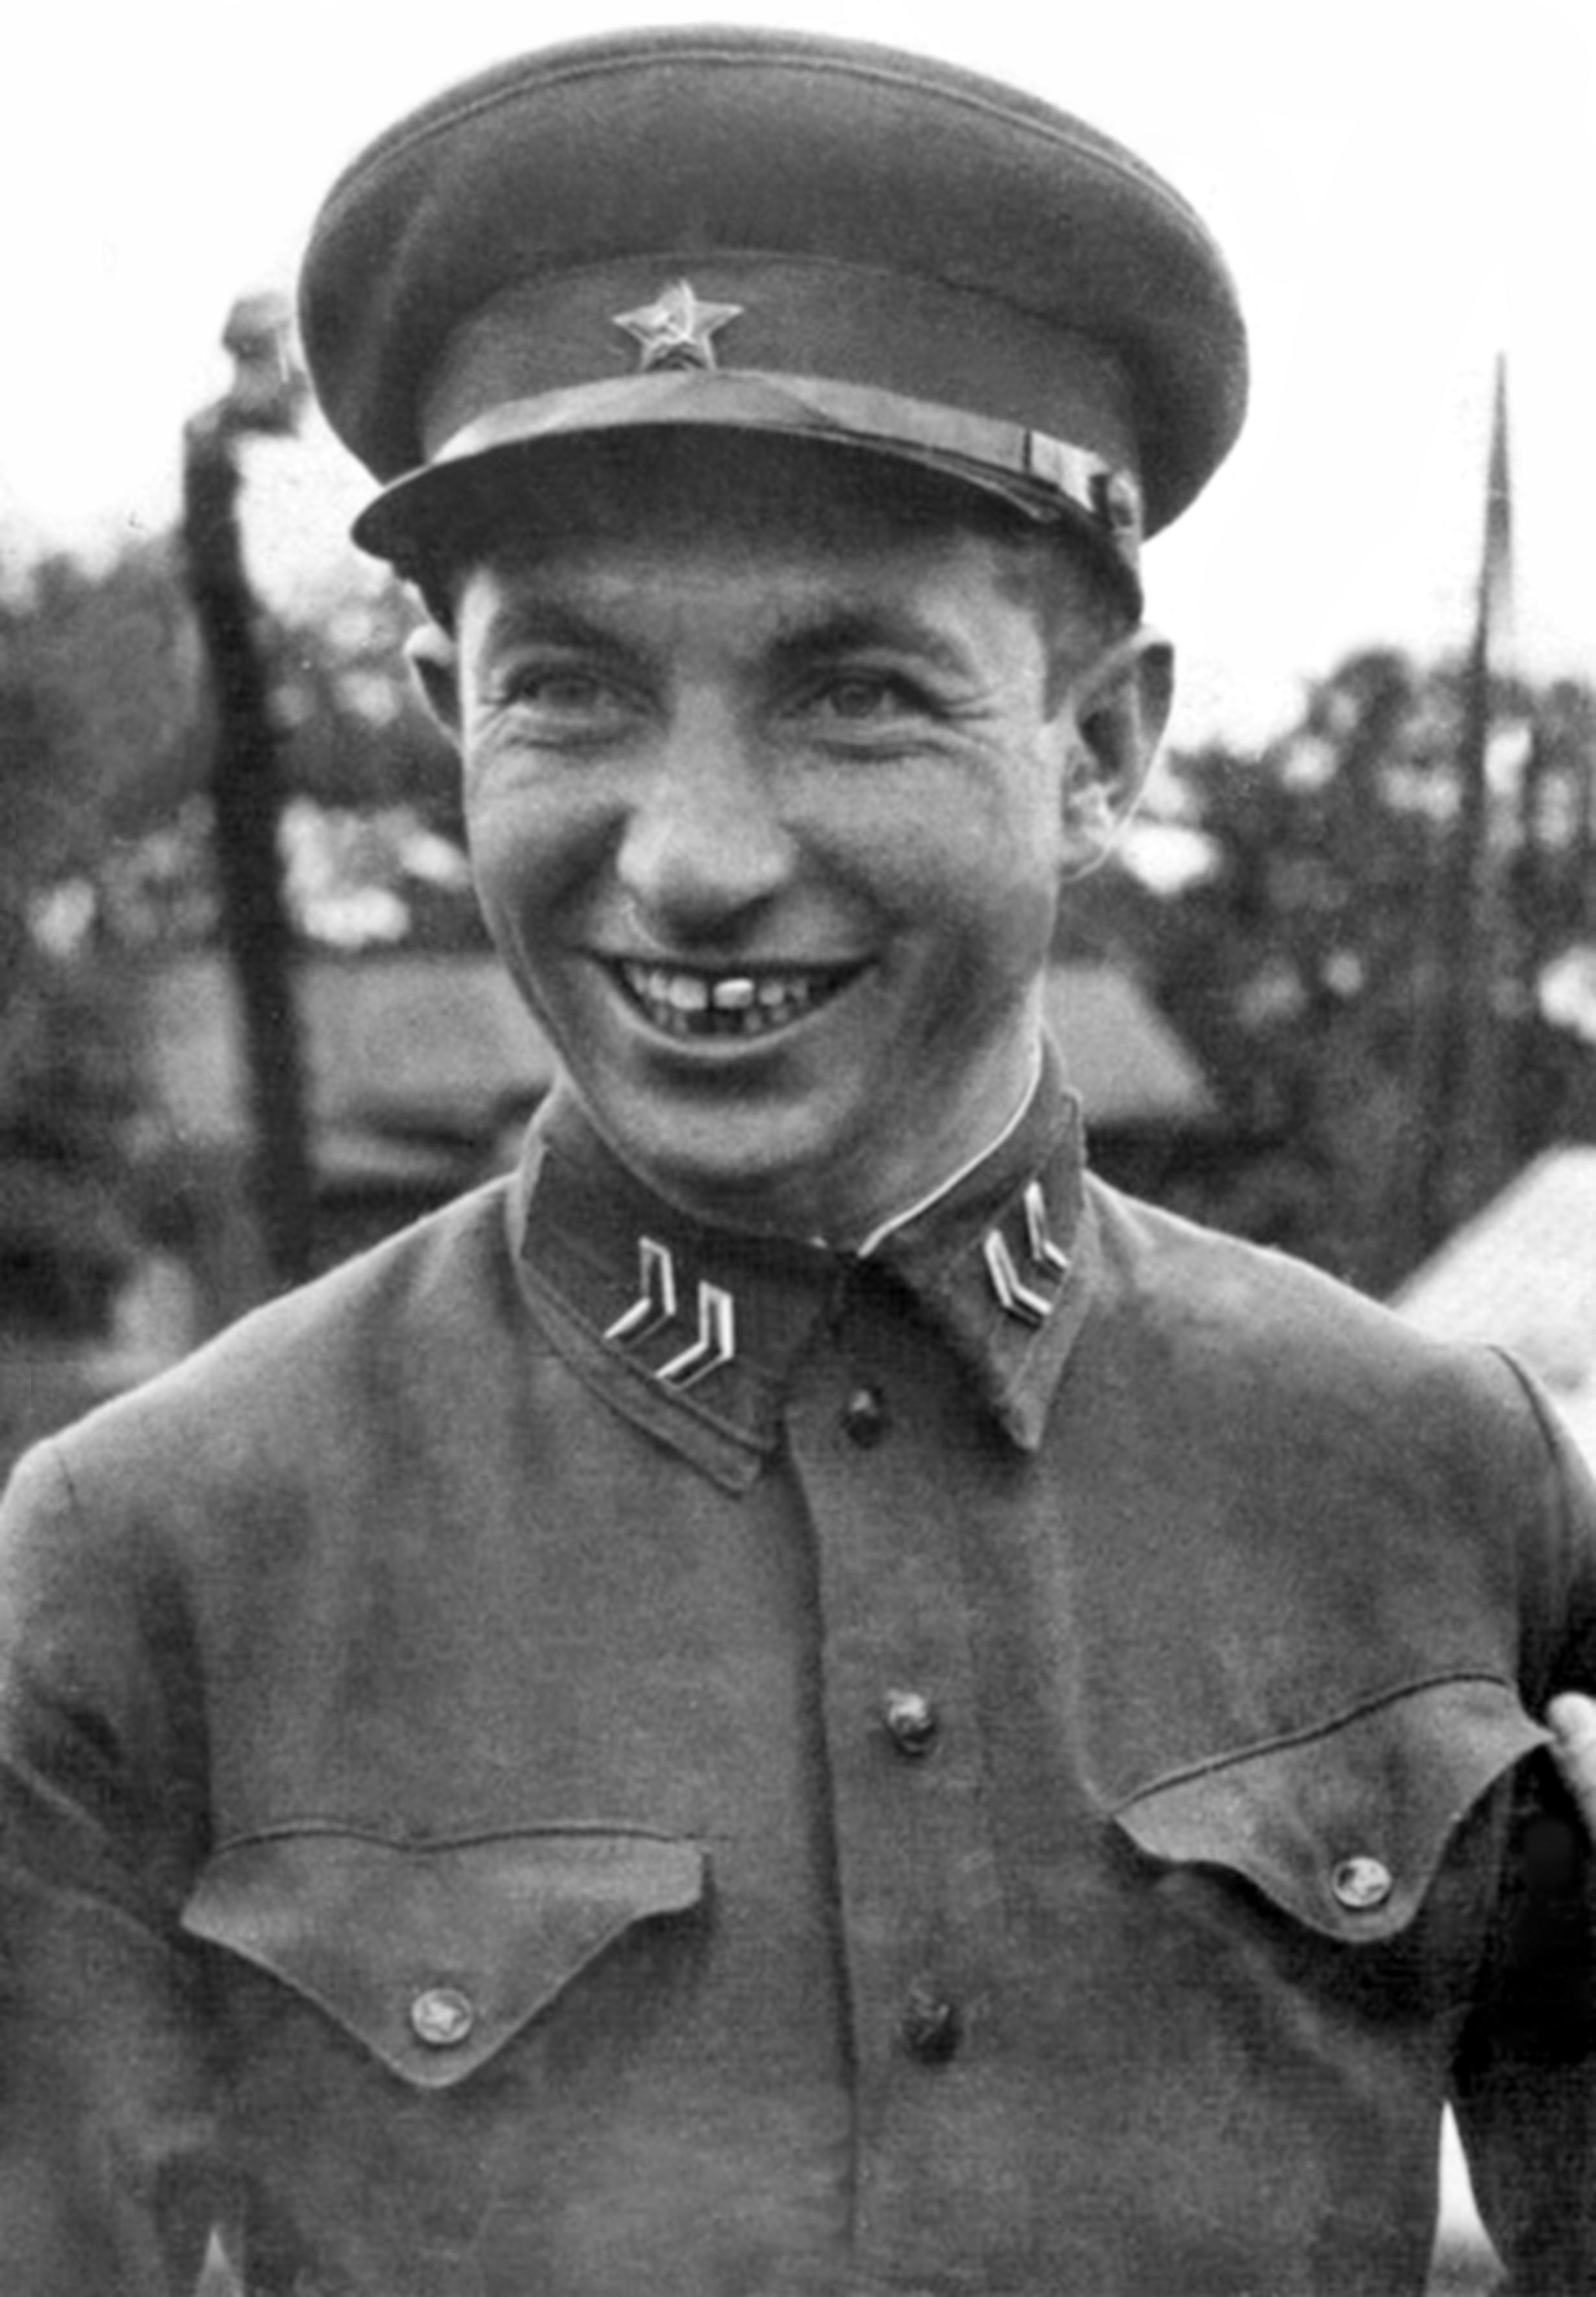 iyun-1936-goda-otd-komandir-ag-shilov.jpg